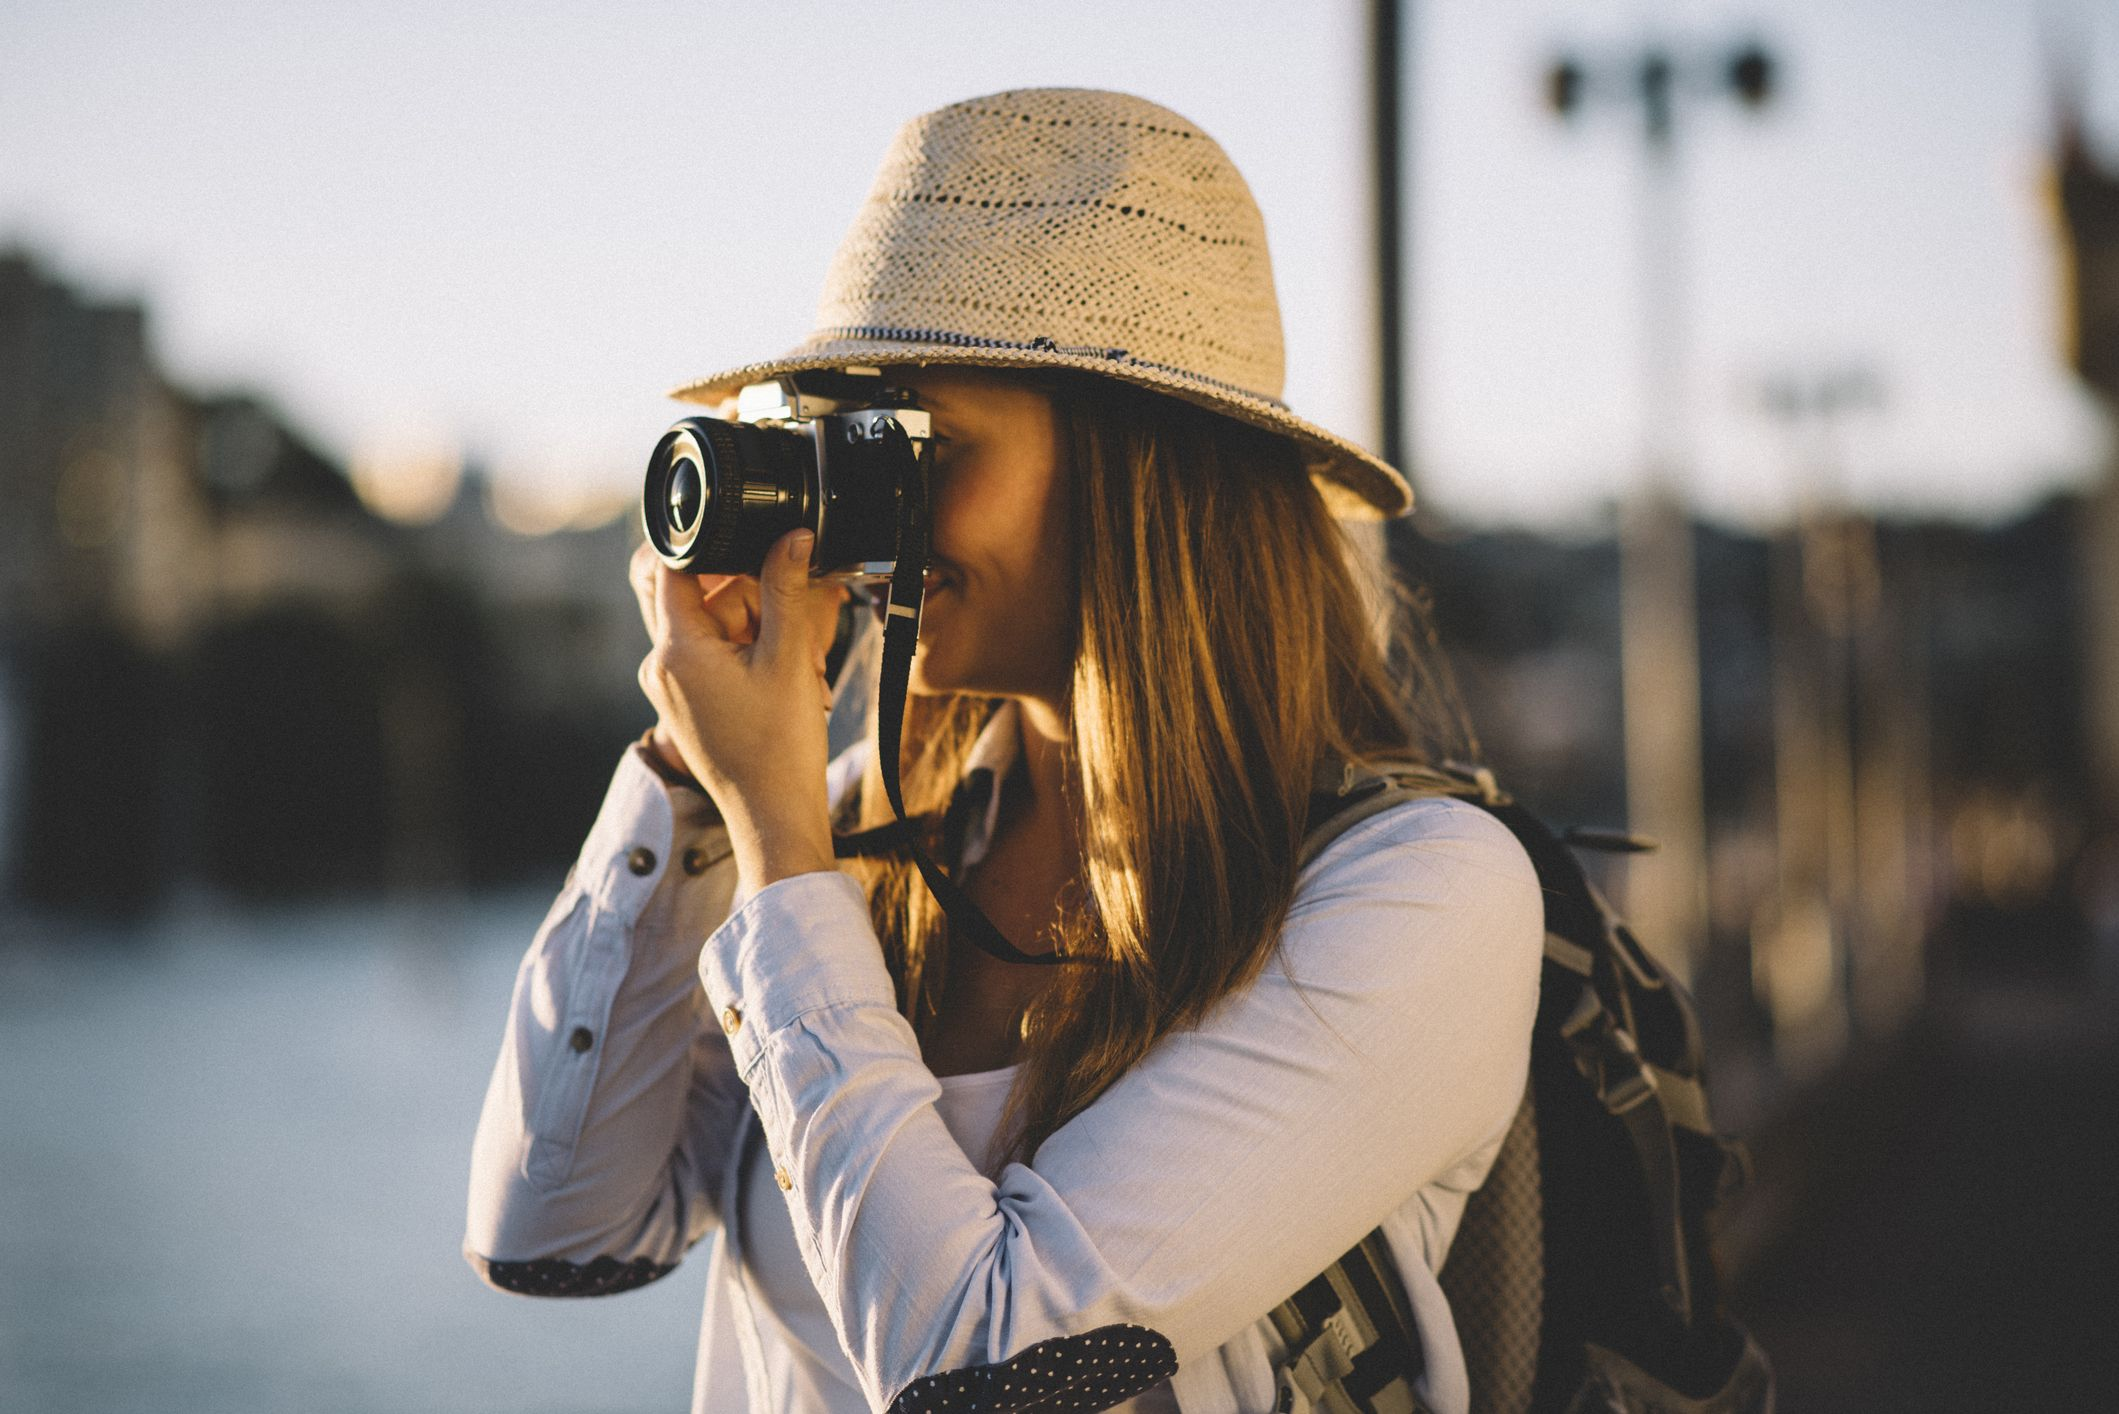 Digital Camera Buying Guide How To Buy A Digital Camera